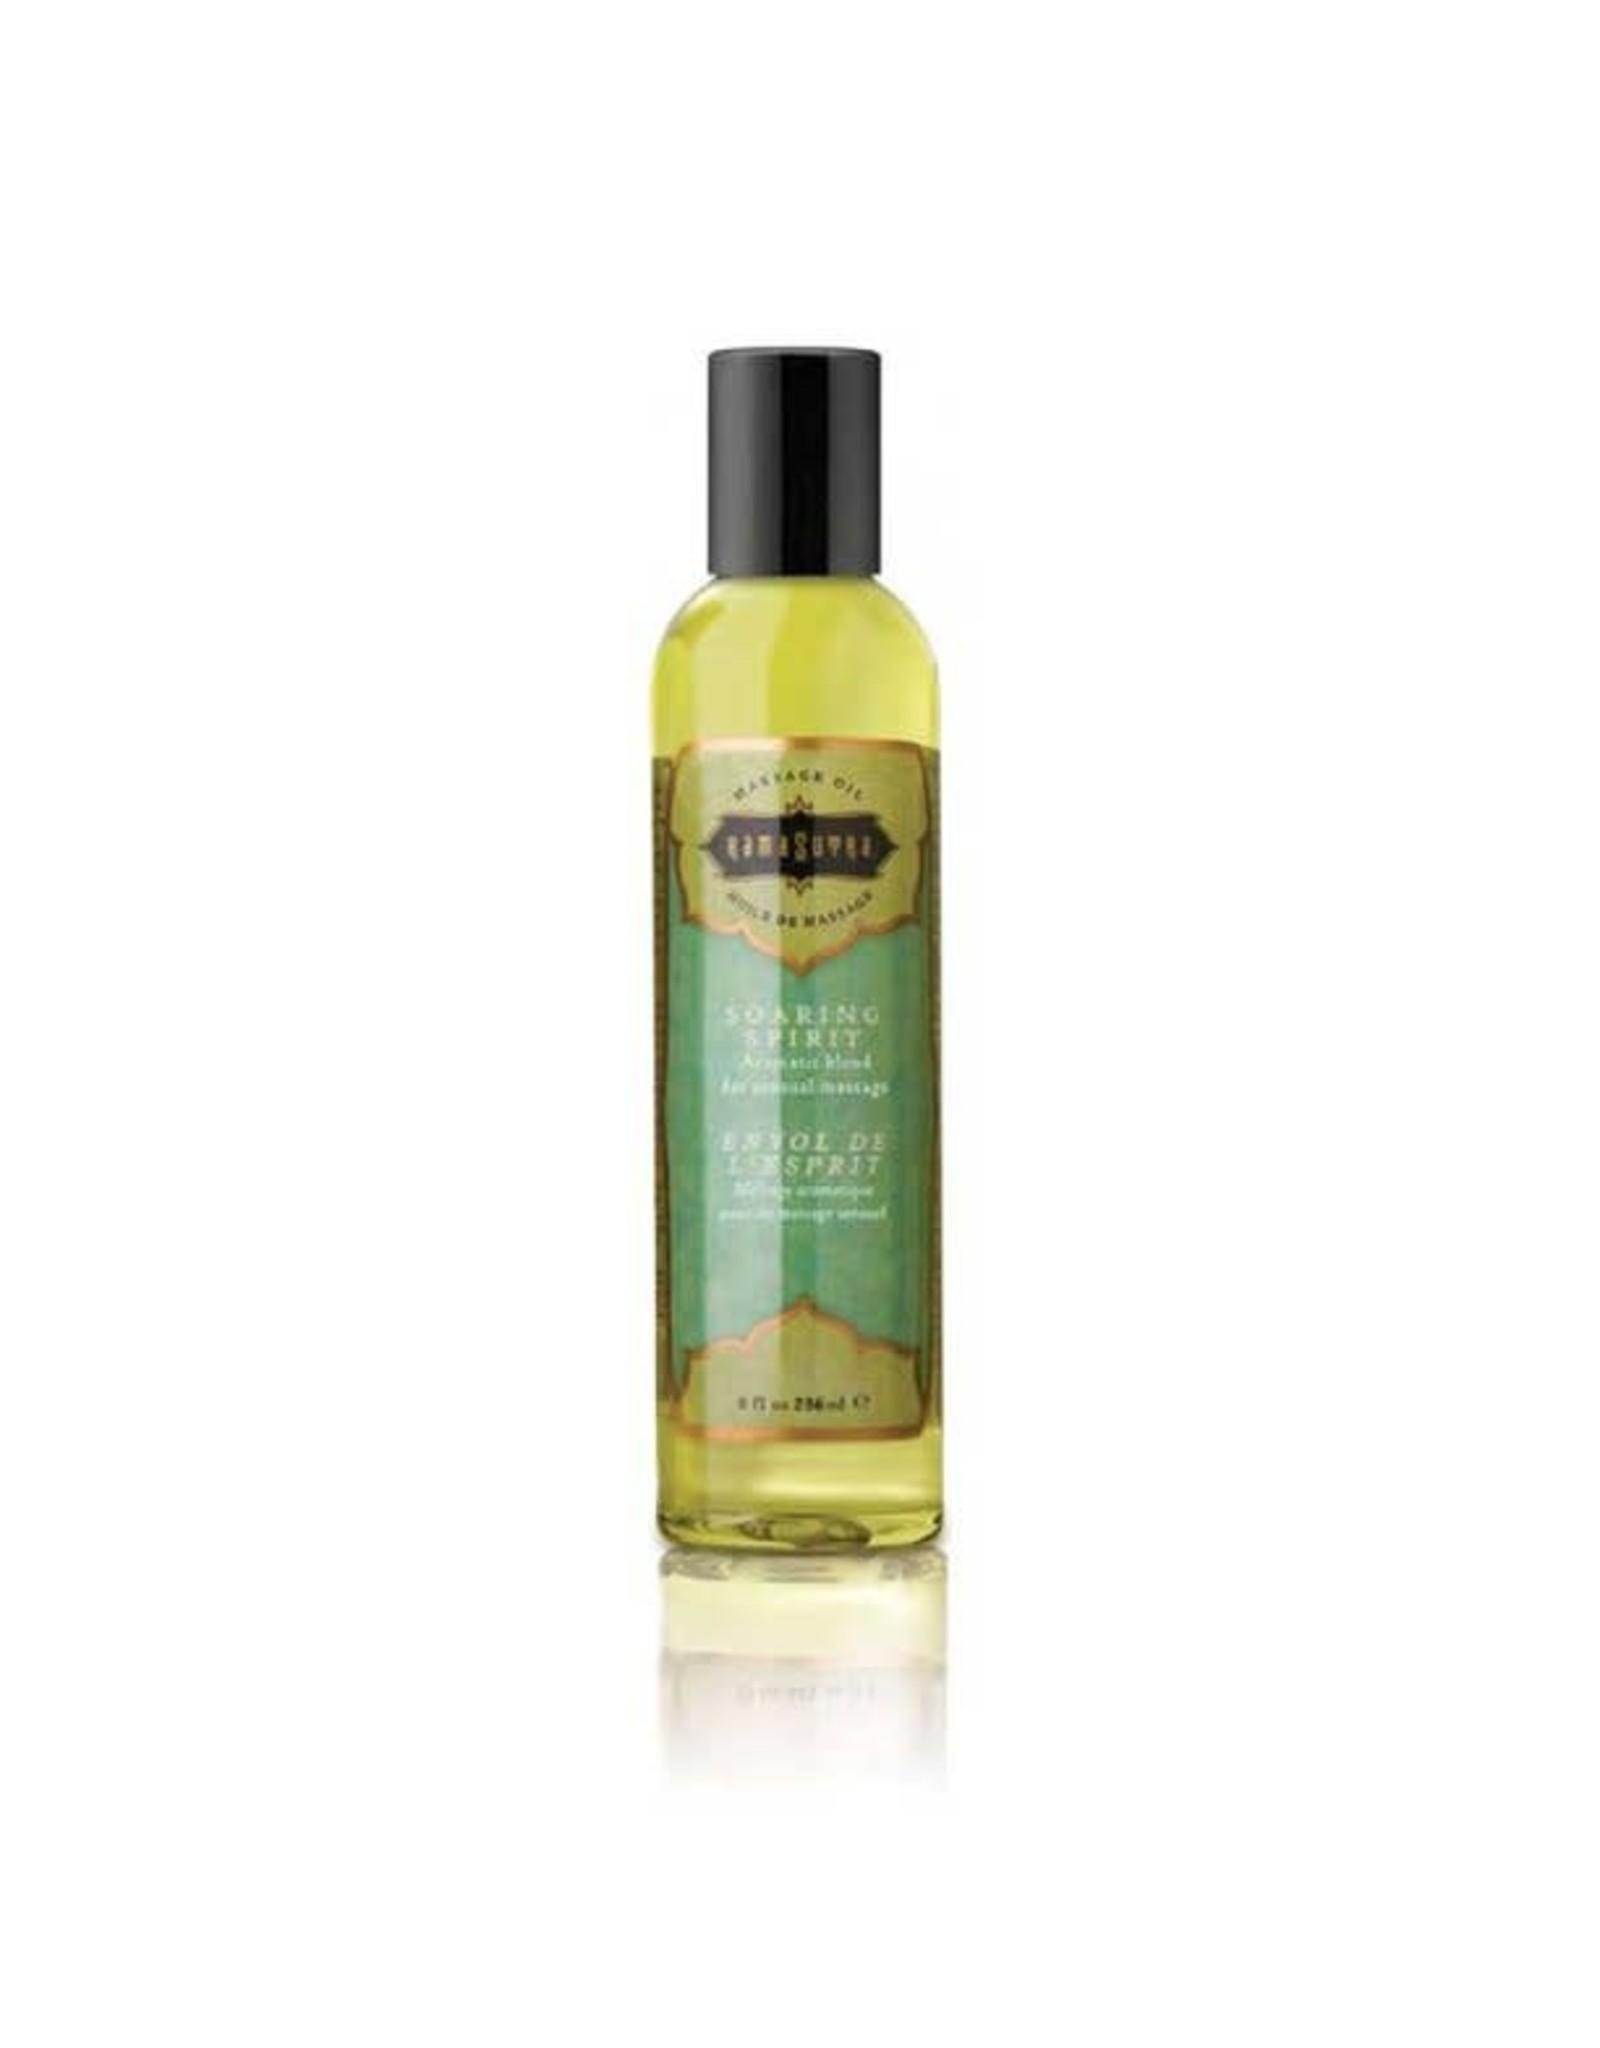 Kama Sutra Kama Sutra Soaring Spirit Massage Oil 739122000239